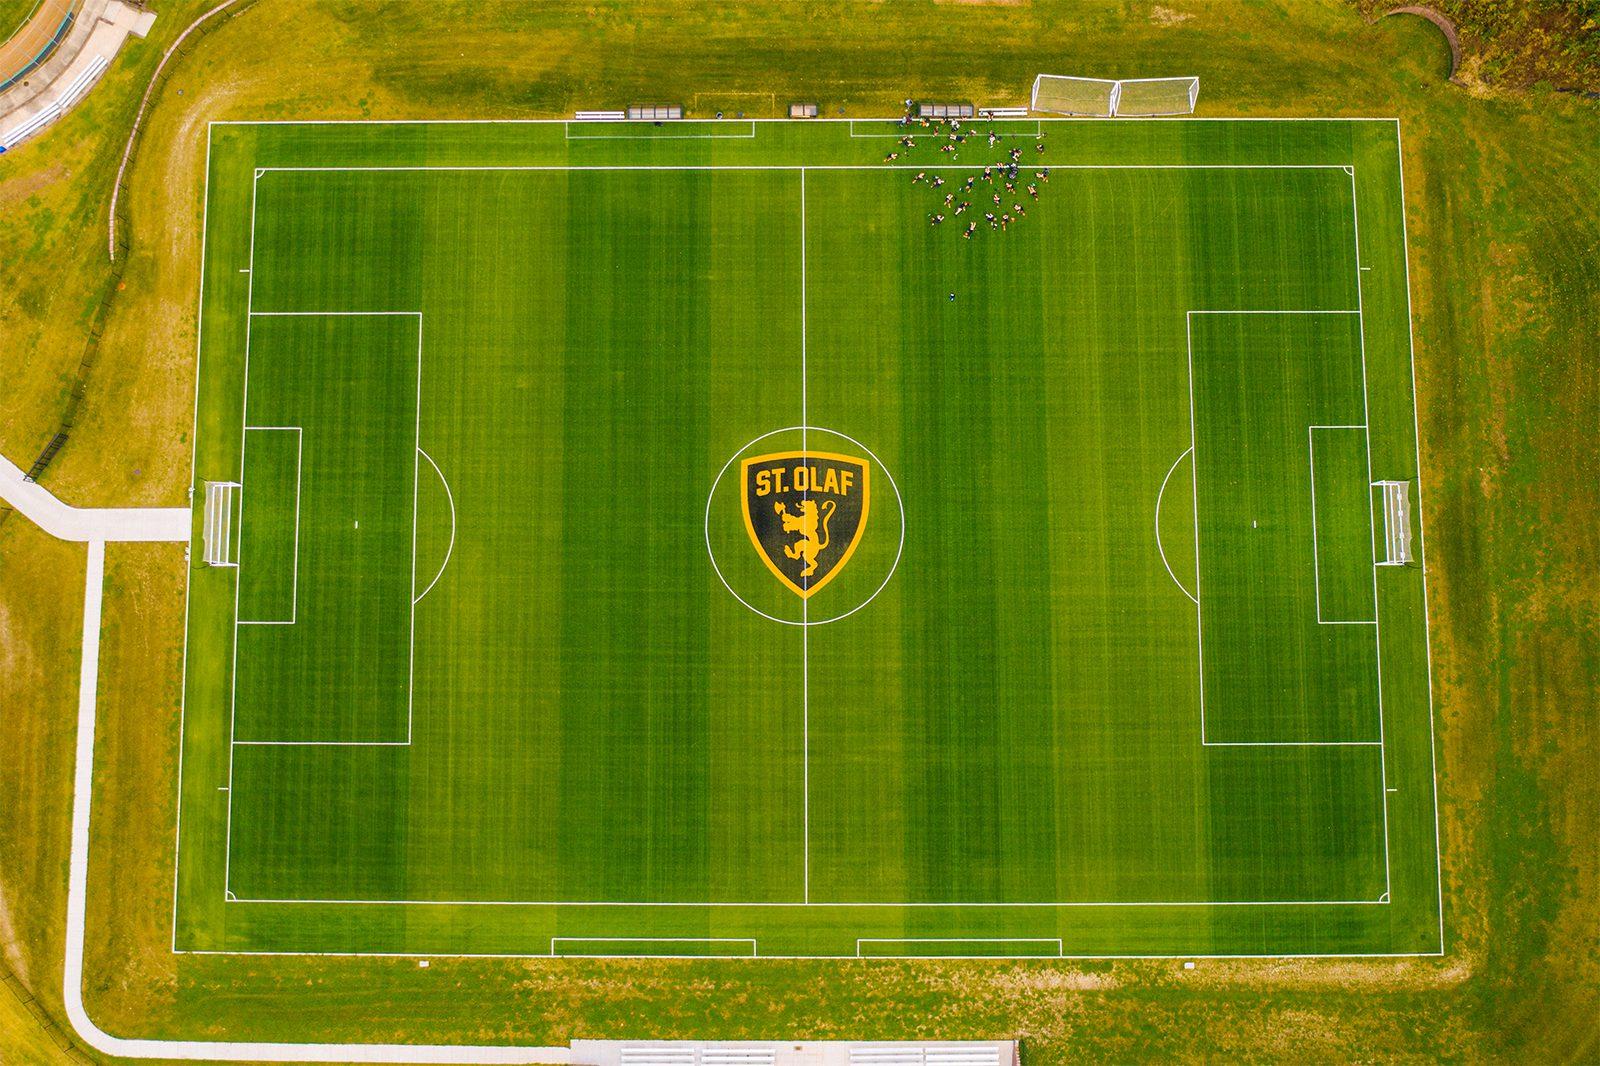 St. Olaf Soccer Field